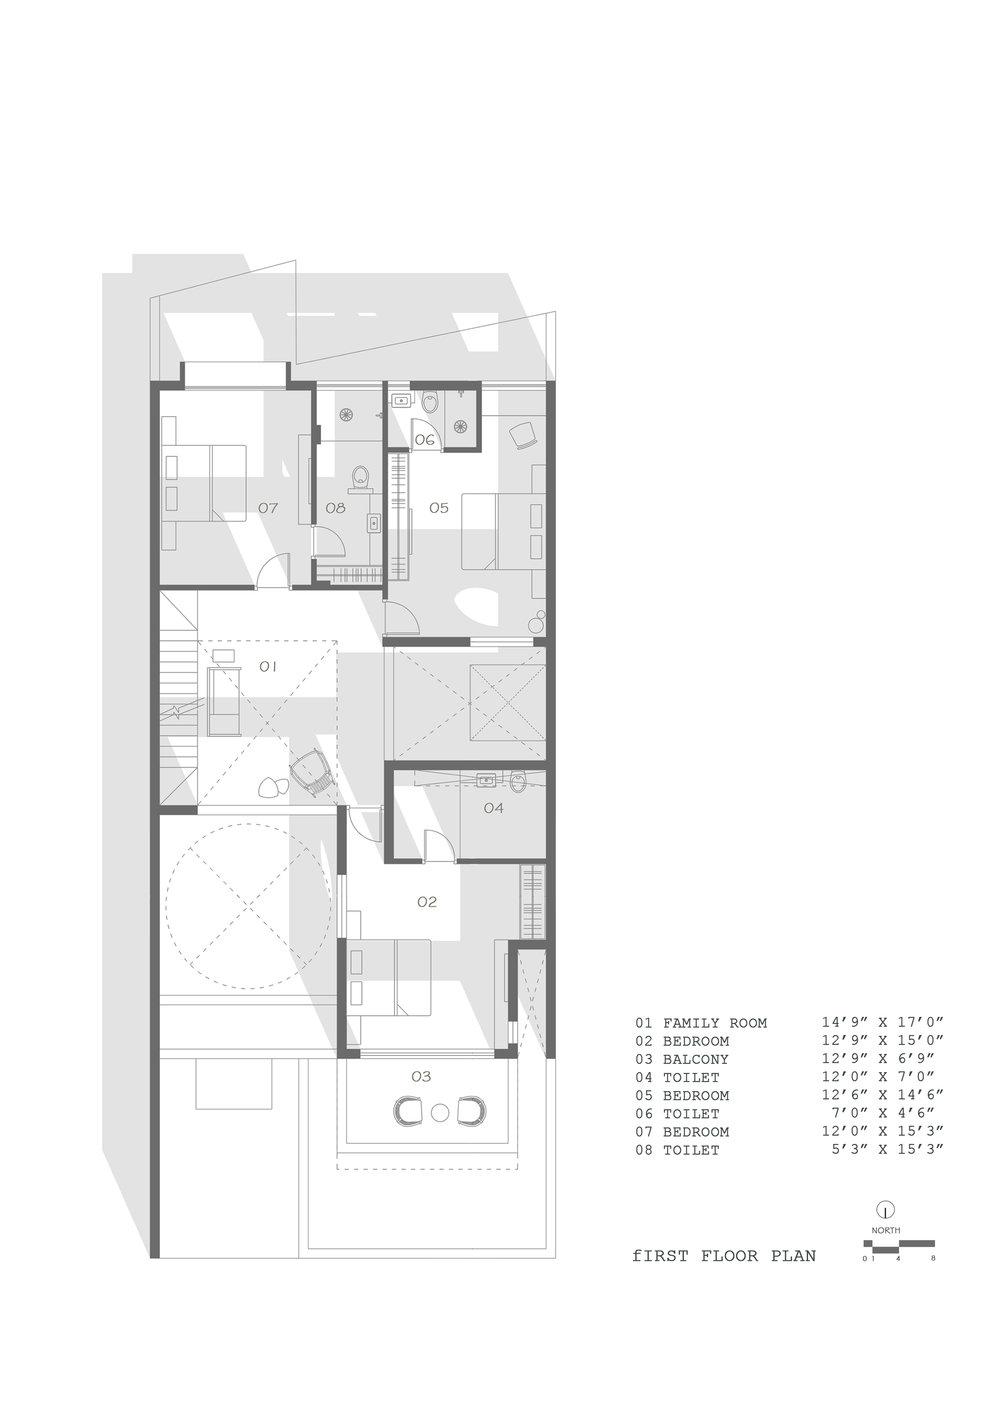 02 First floor plan.jpg